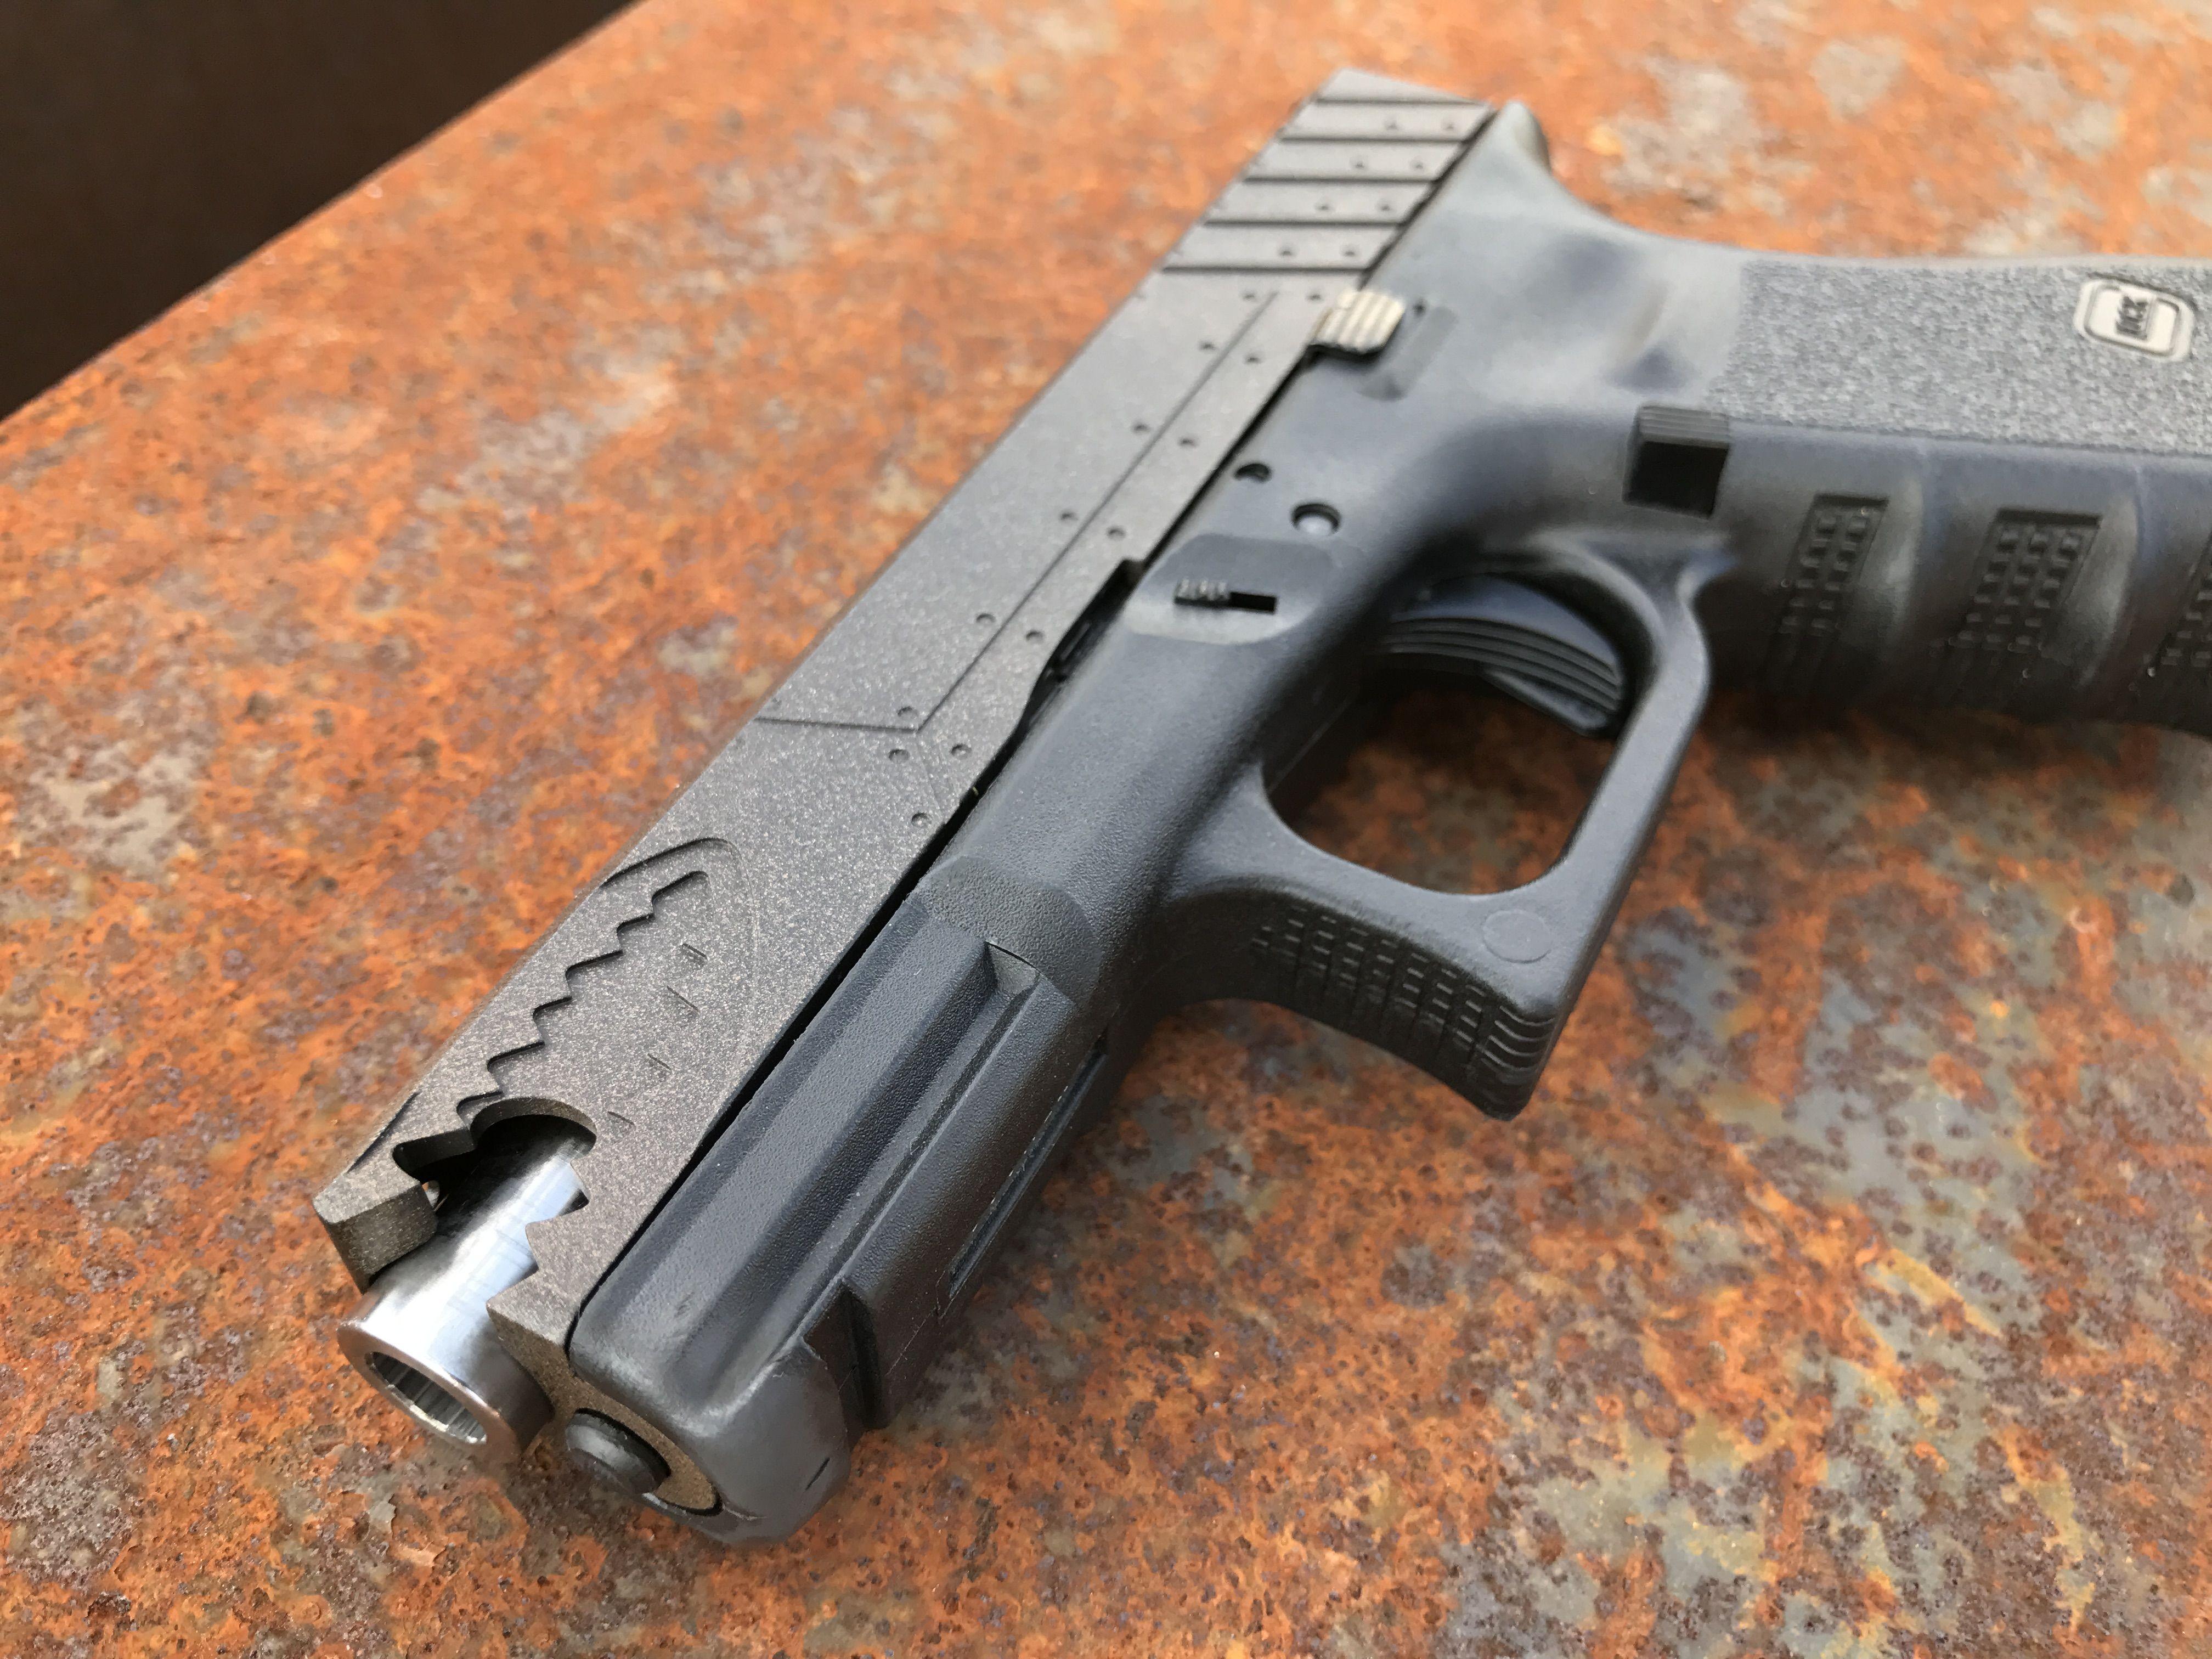 WarHog Glock 19 aftermarket slideLoading that magazine is a pain ...